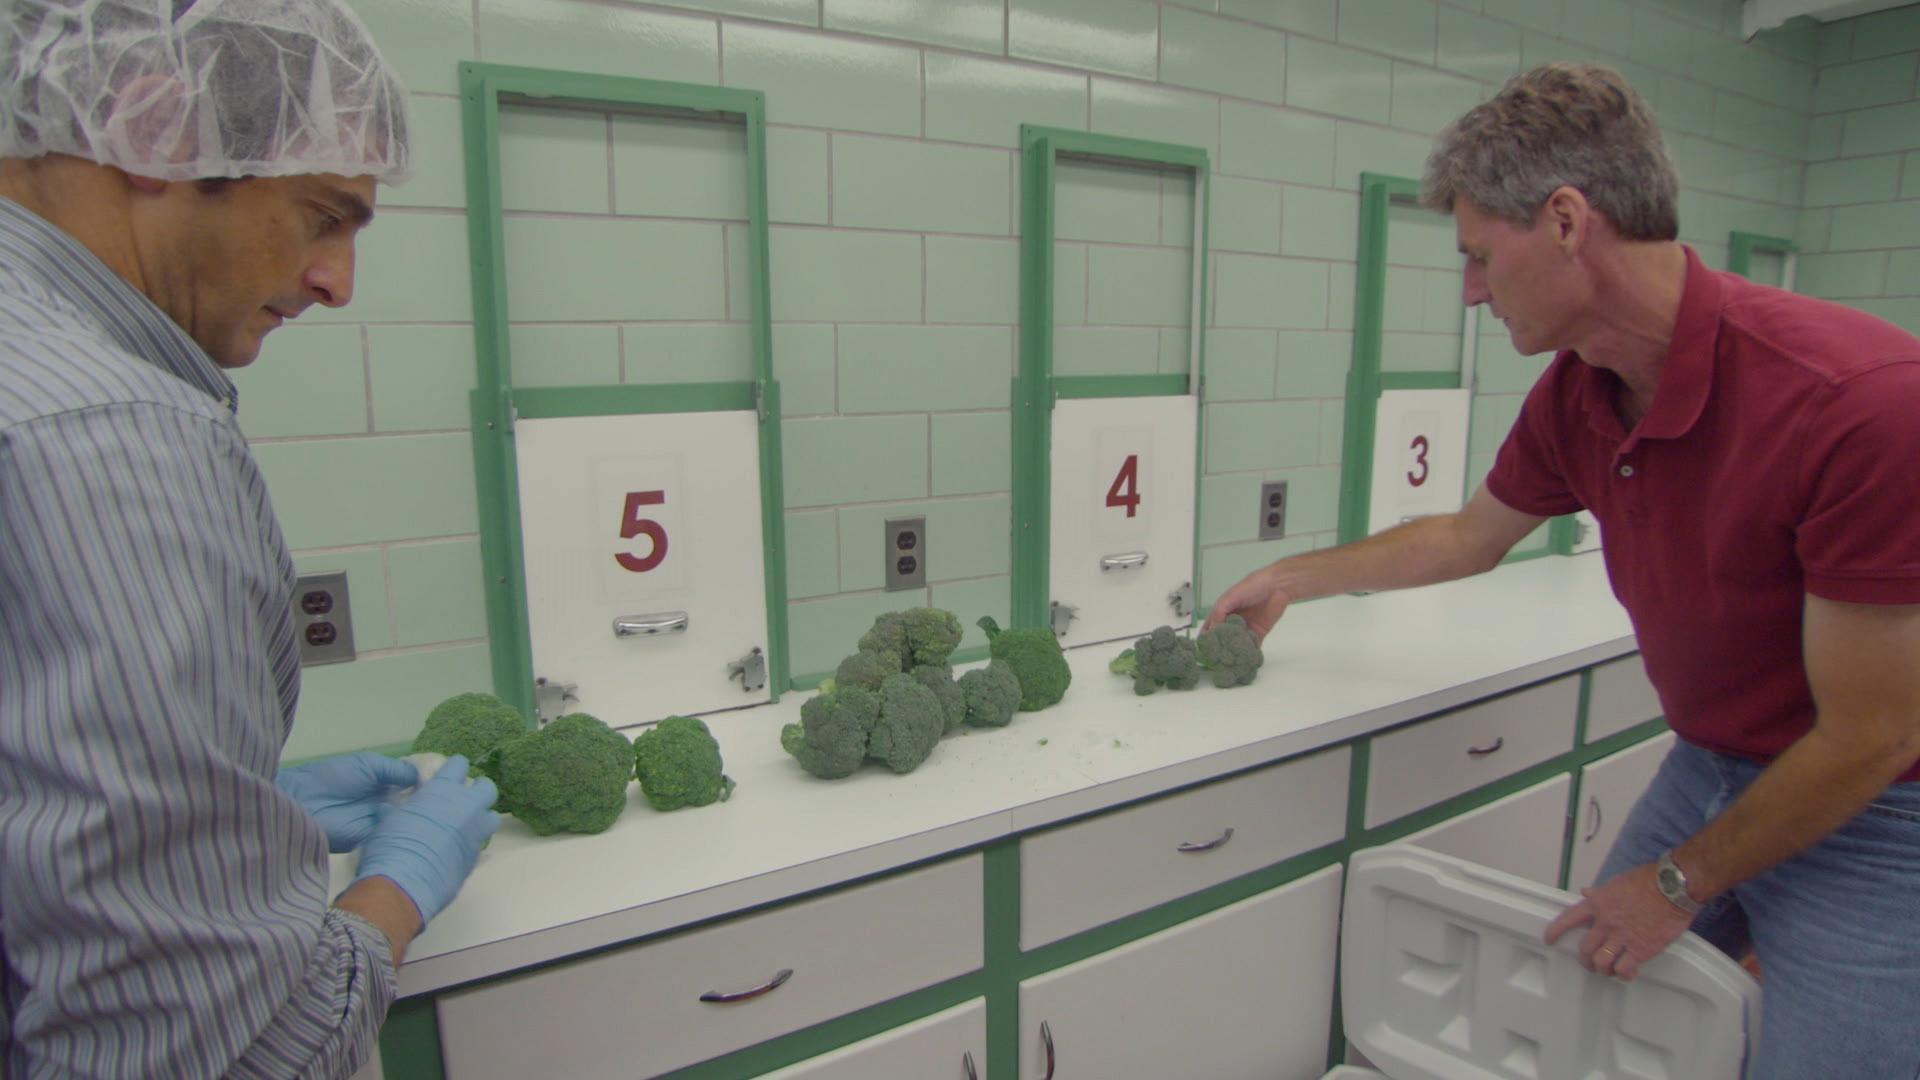 Web Extra: Broccoli Man